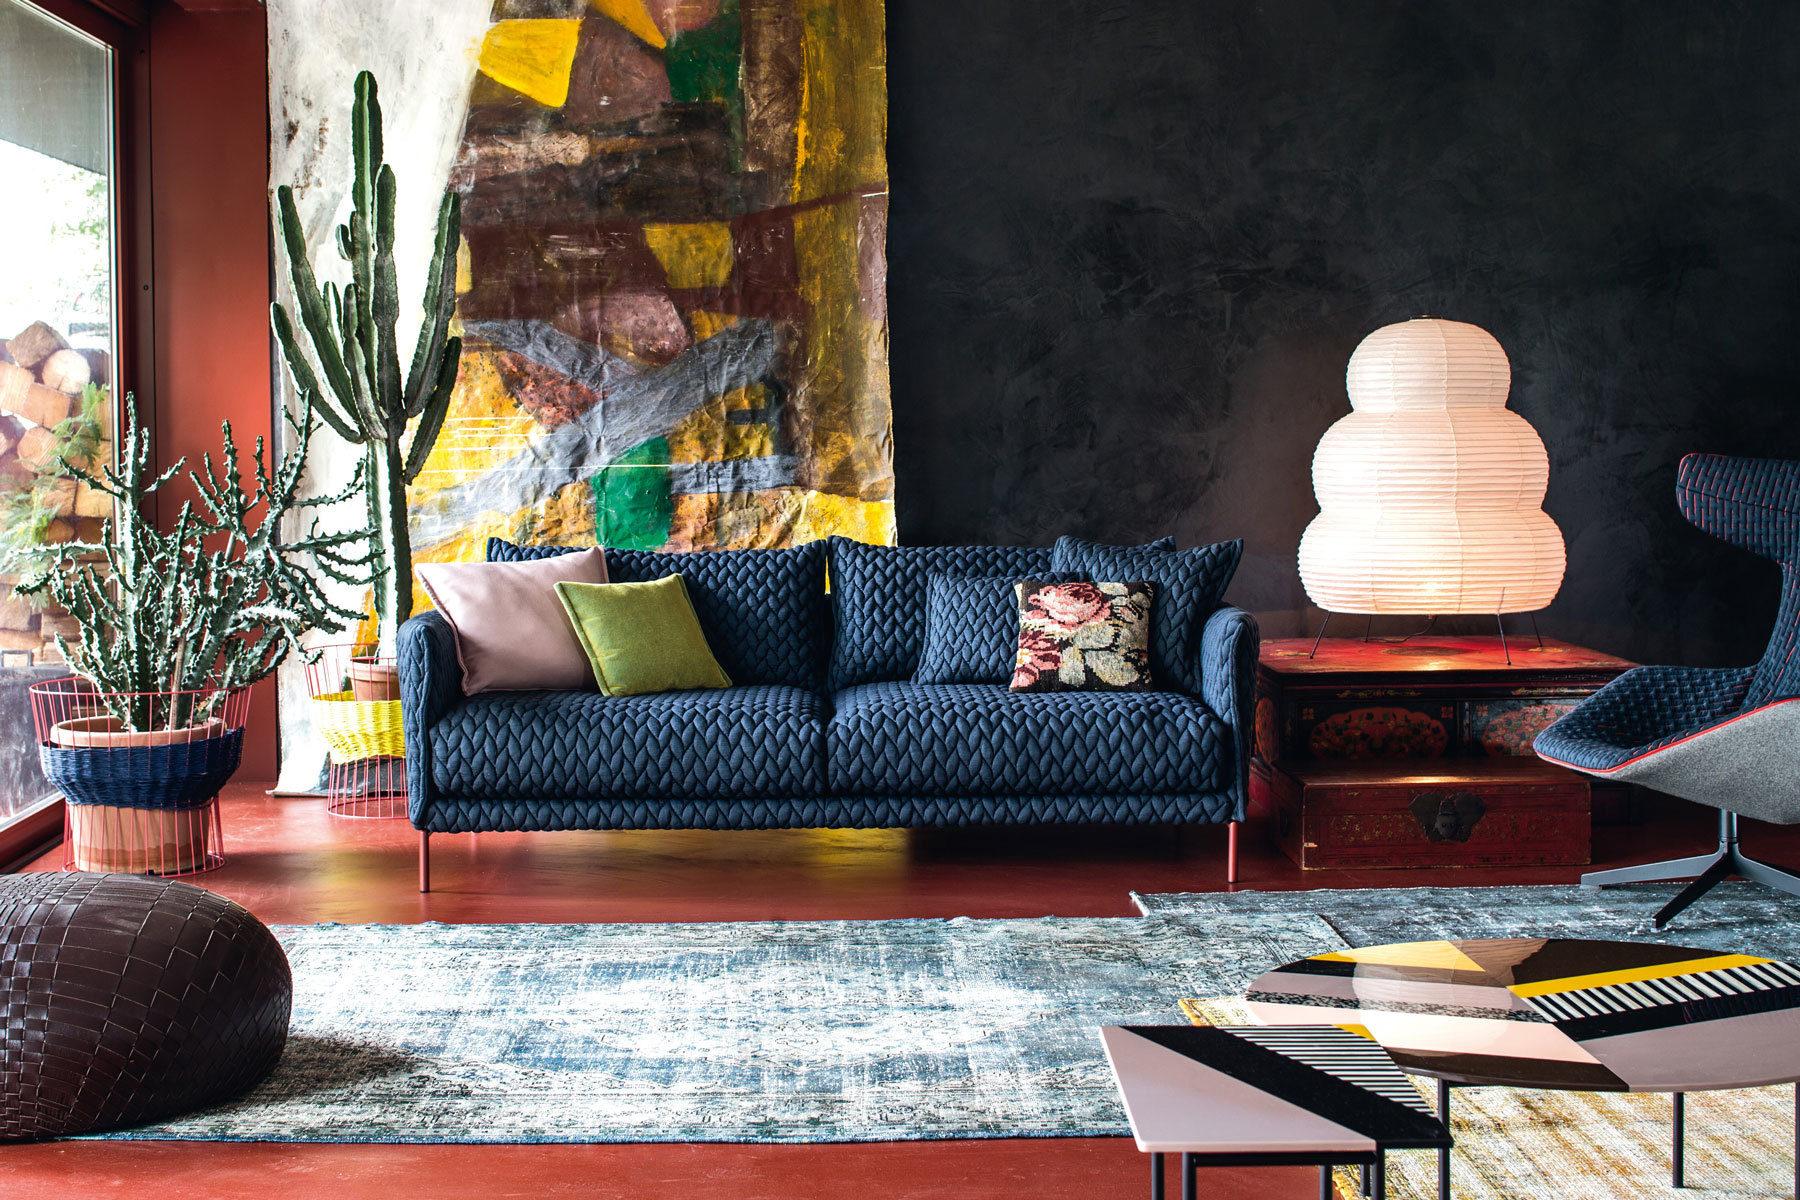 maek-luxury-home-inspiration-mobilia-couch-blog-7.jpg